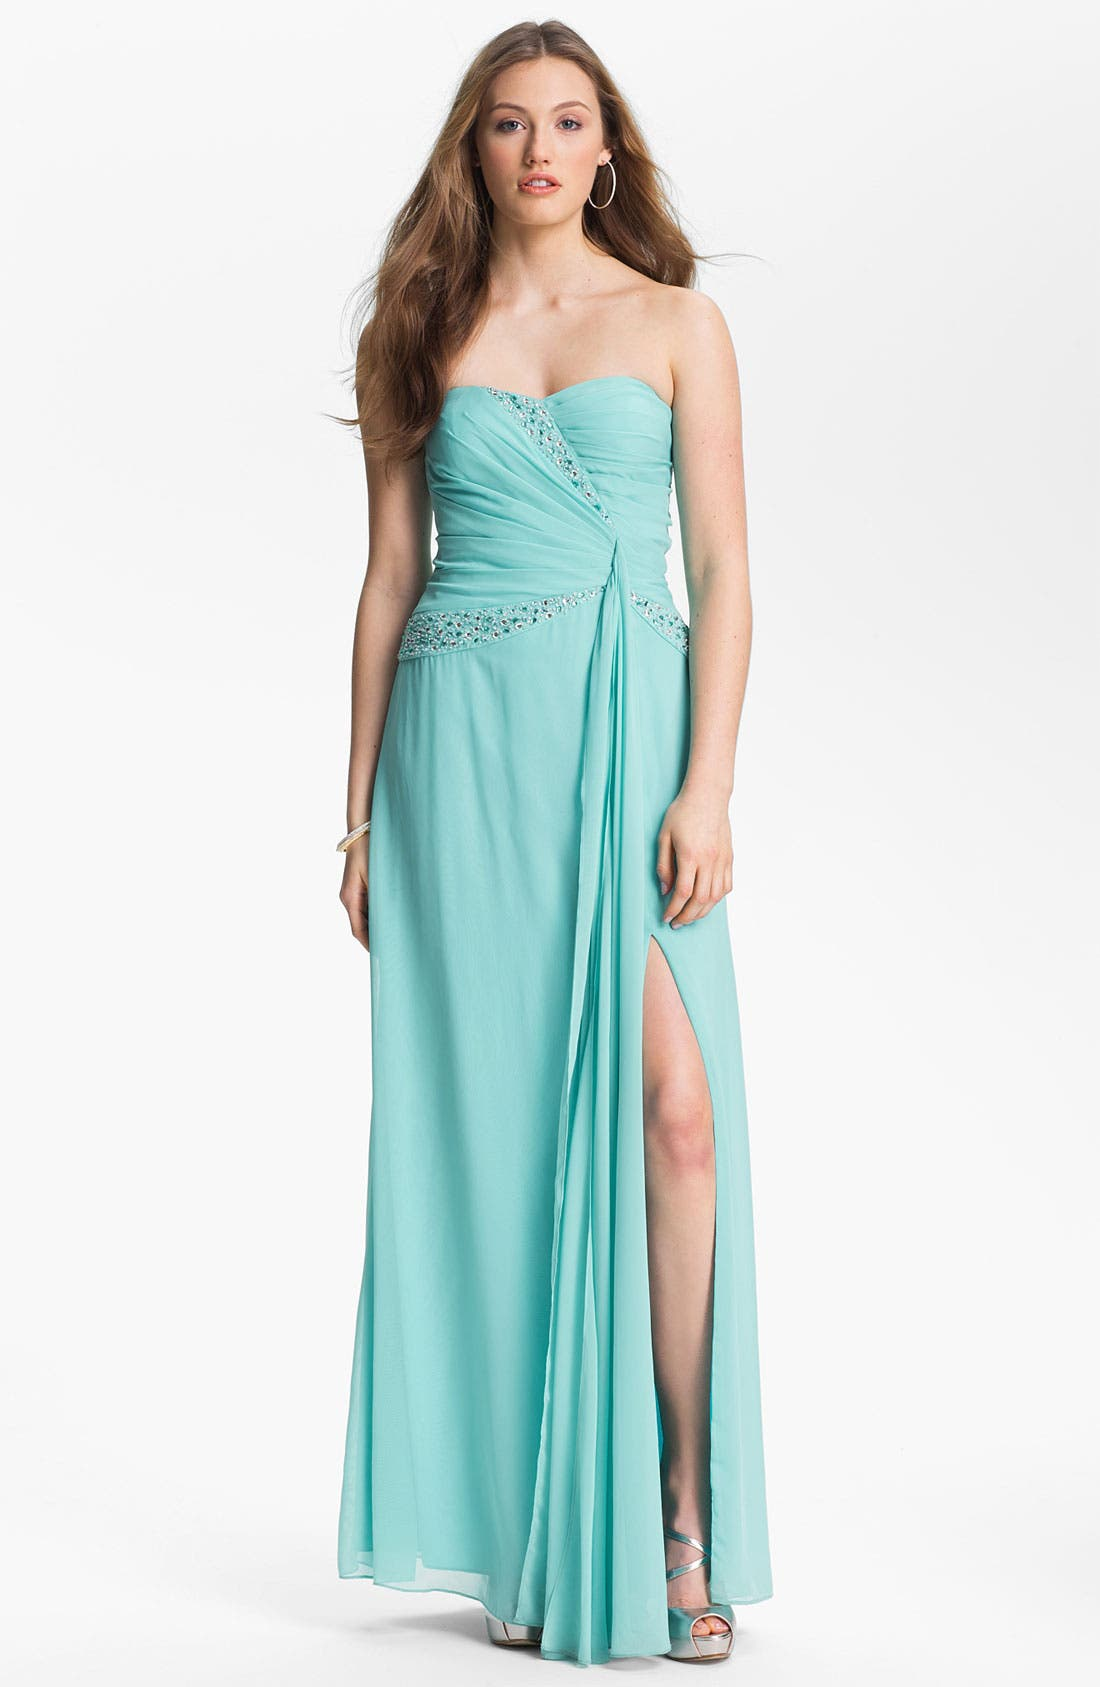 Main Image - Hailey by Adrianna Papell Jeweled Chiffon Dress